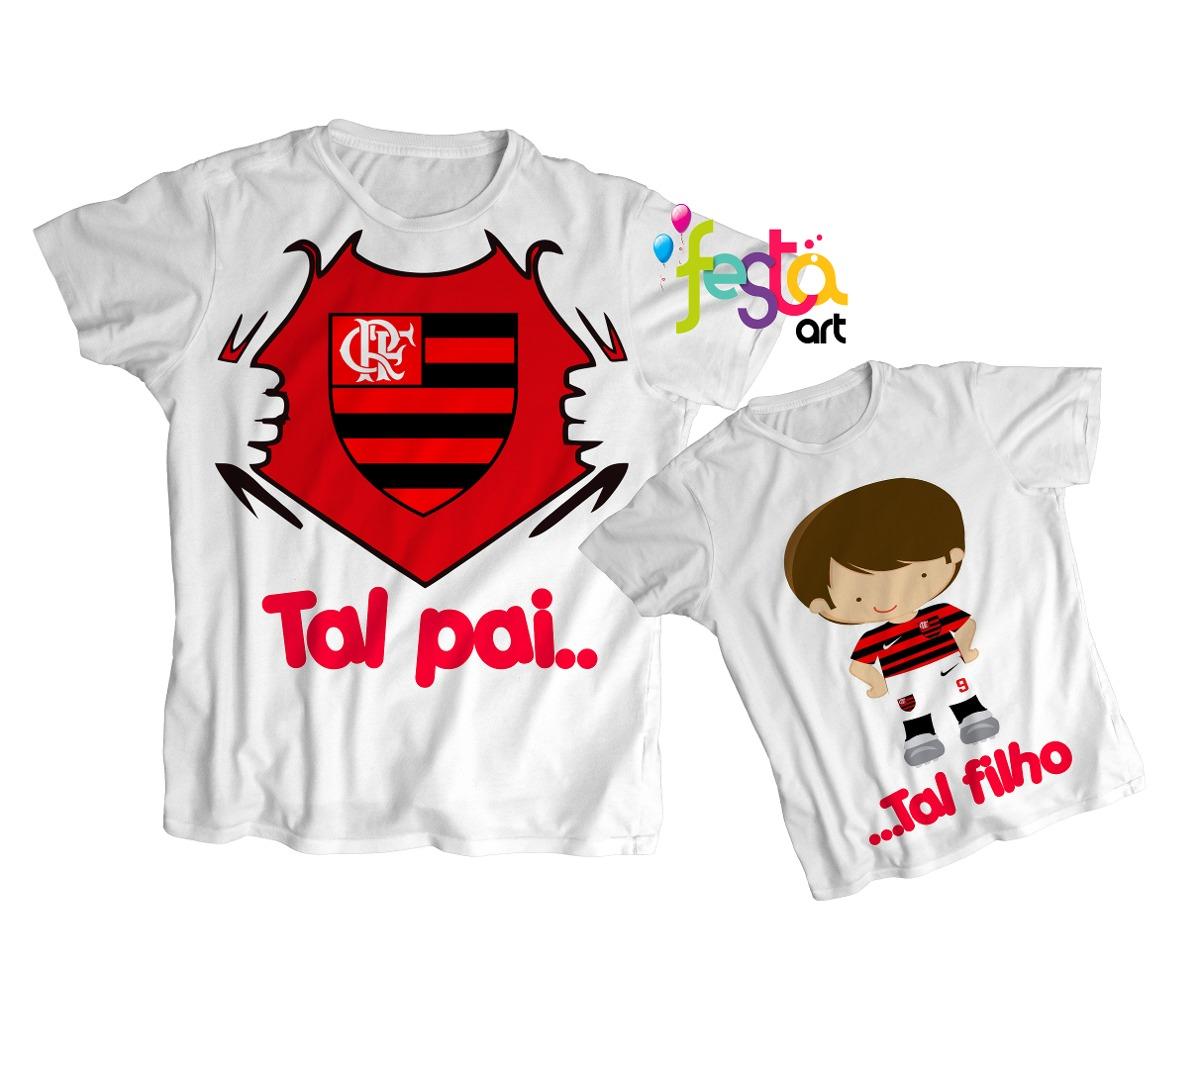 4f8ad403b6 Kit 3 Blusas Tal Pai Tal Filho Flamengo Ou Qualquer Time - R  89